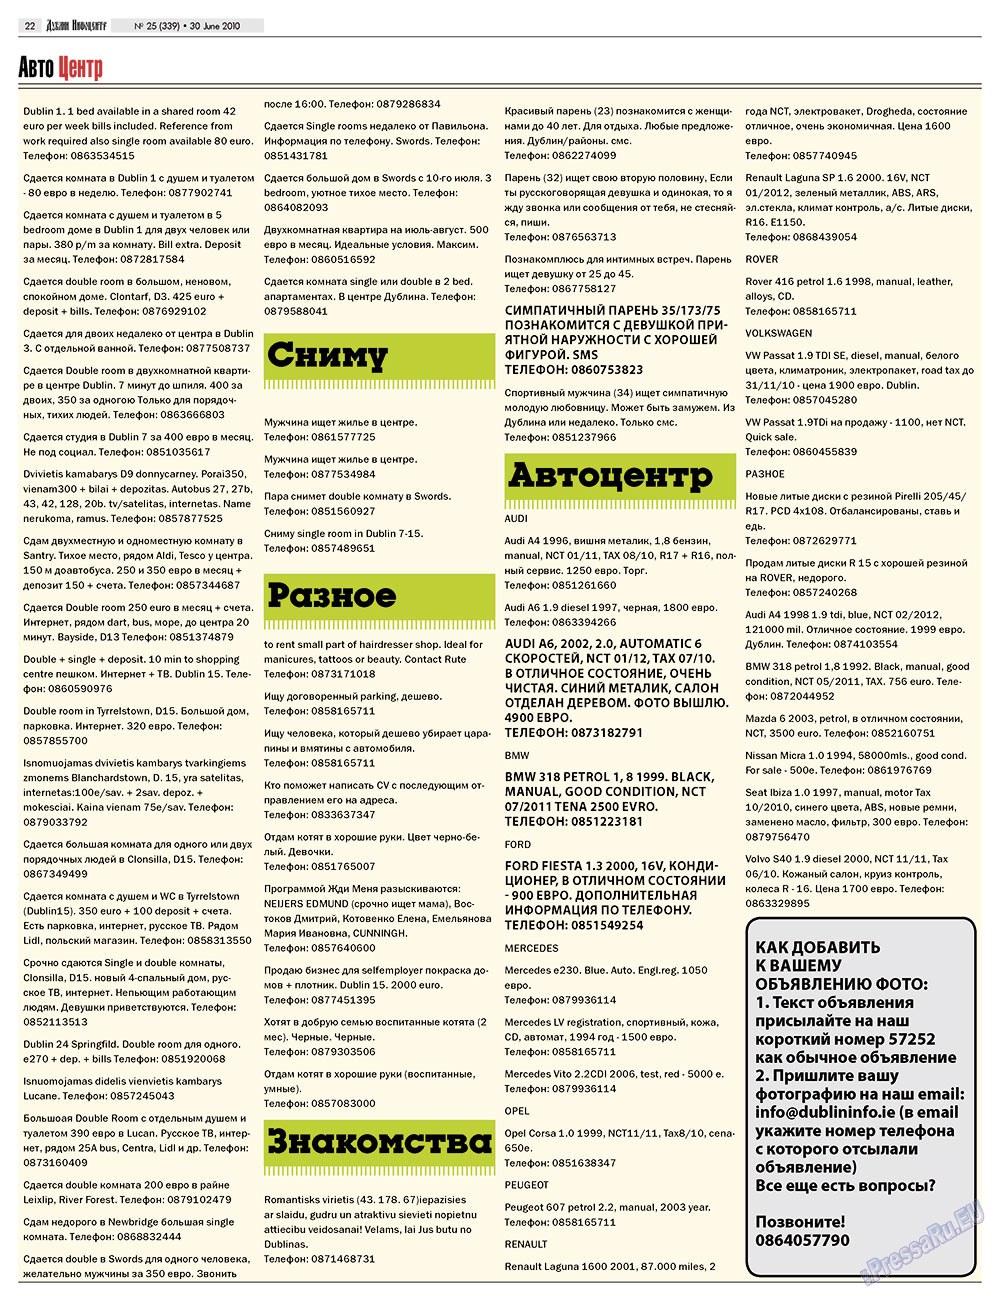 Дублин инфоцентр (газета). 2010 год, номер 25, стр. 22